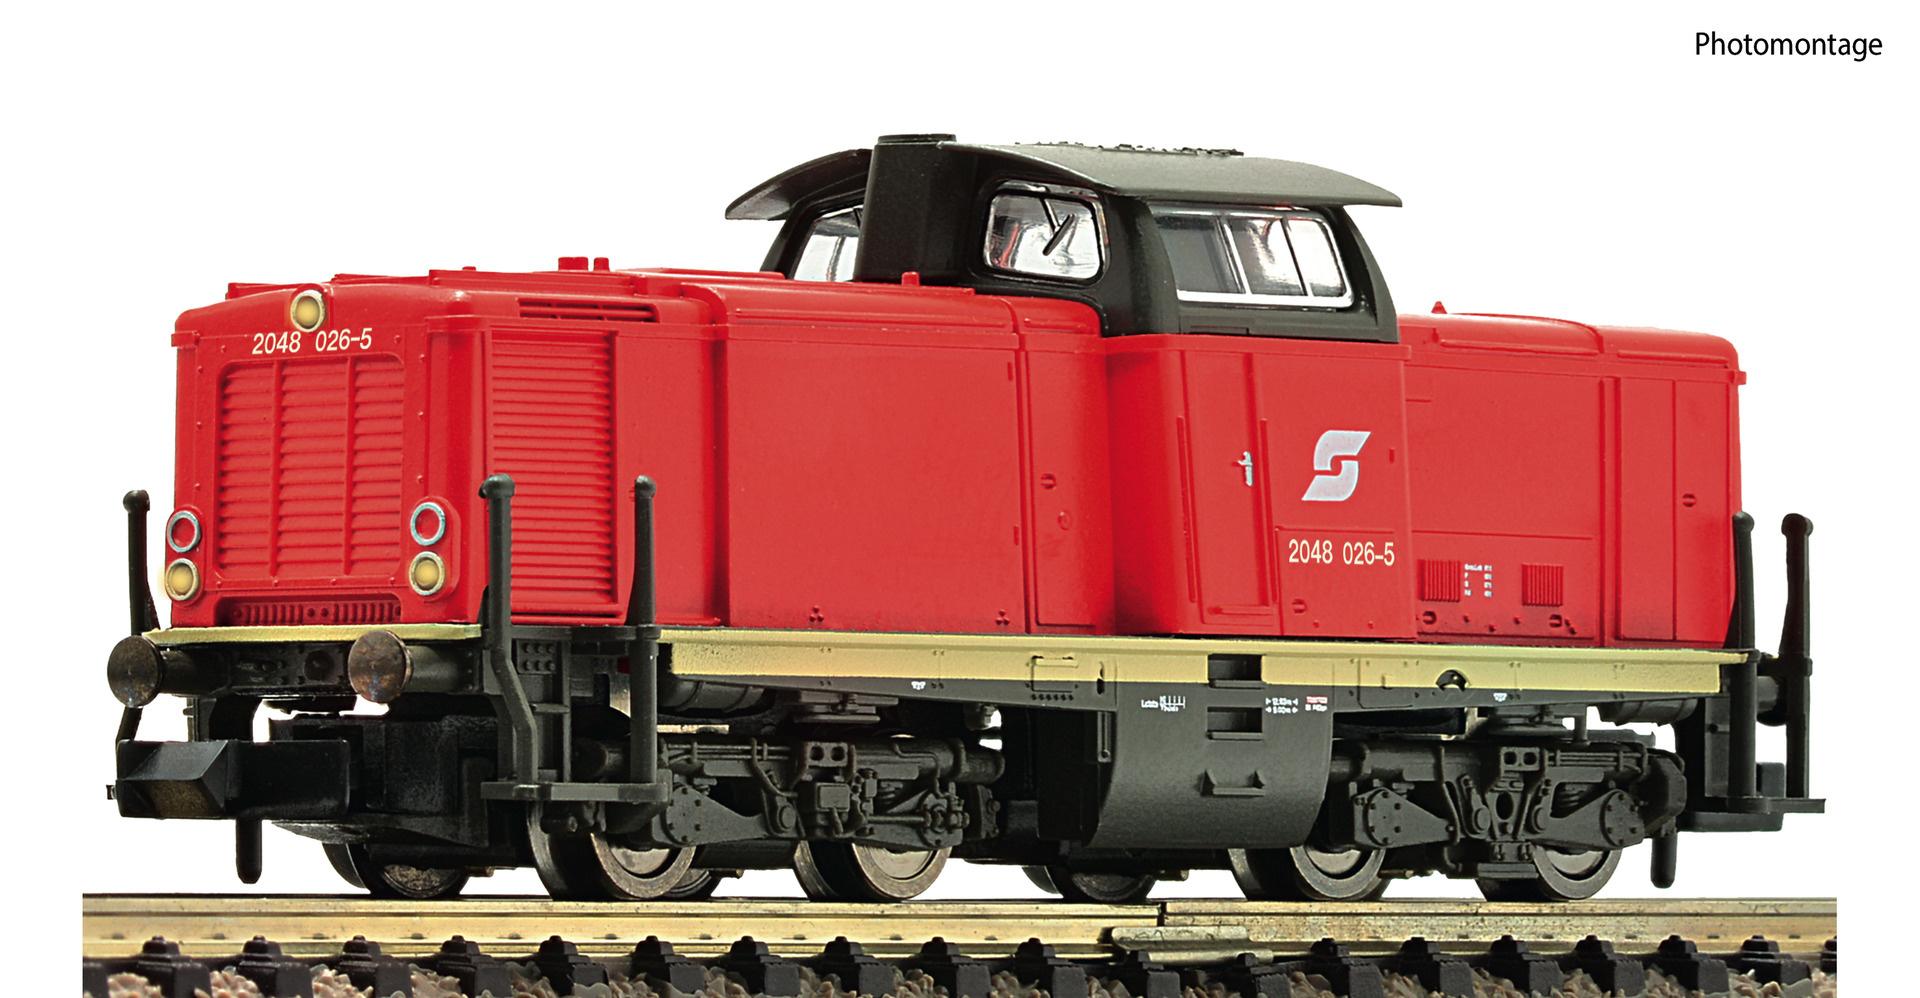 722887 Diesellok Rh 2048 ÖBB DCC-1